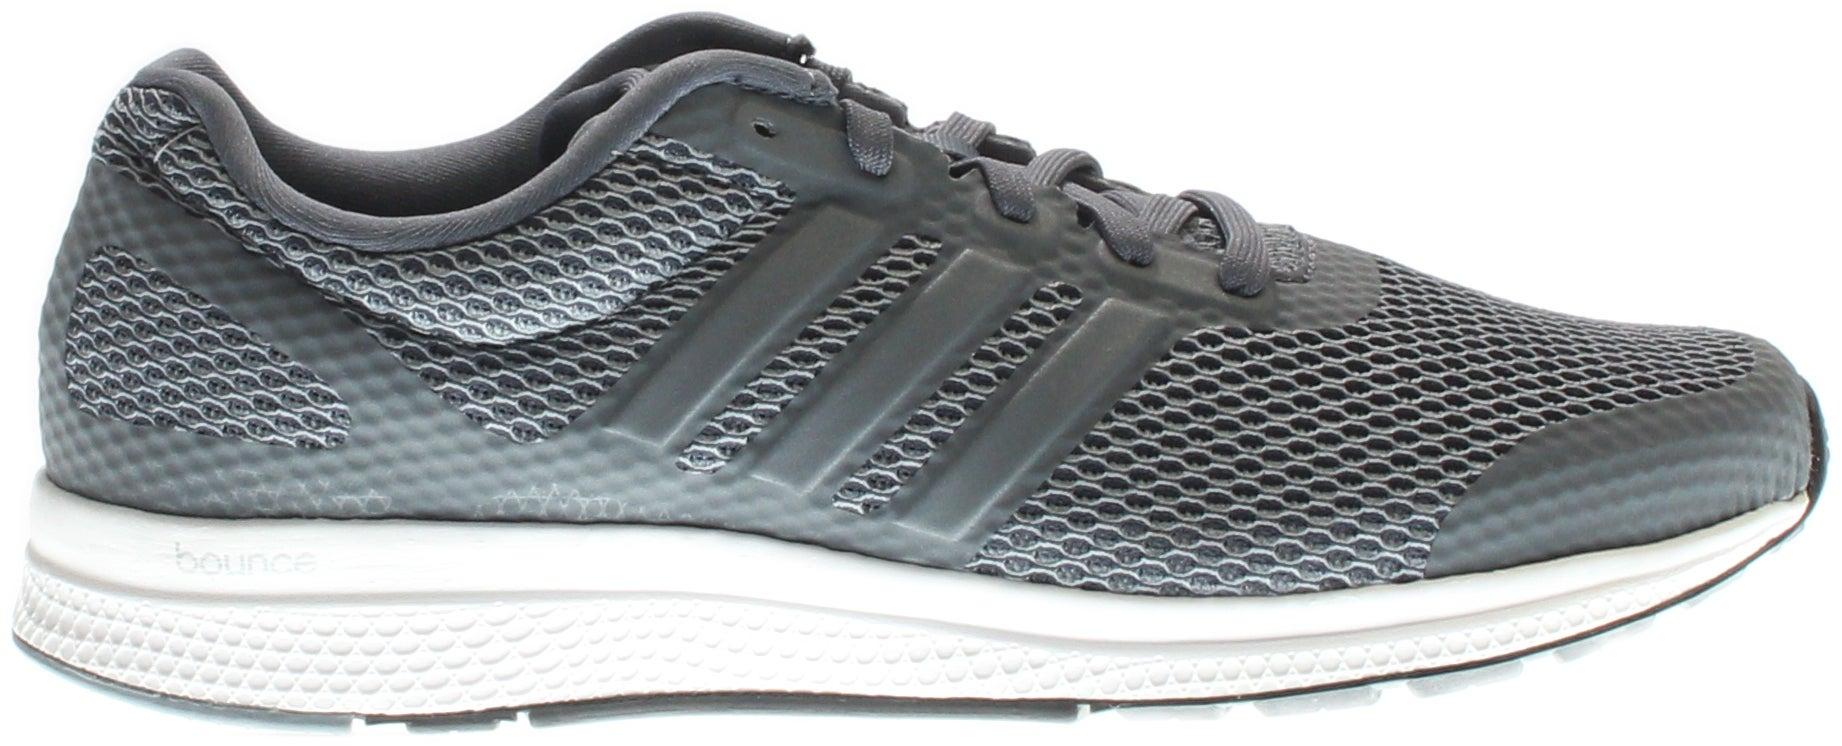 adidas Mana Bounce Grey - Mens  - Size 8